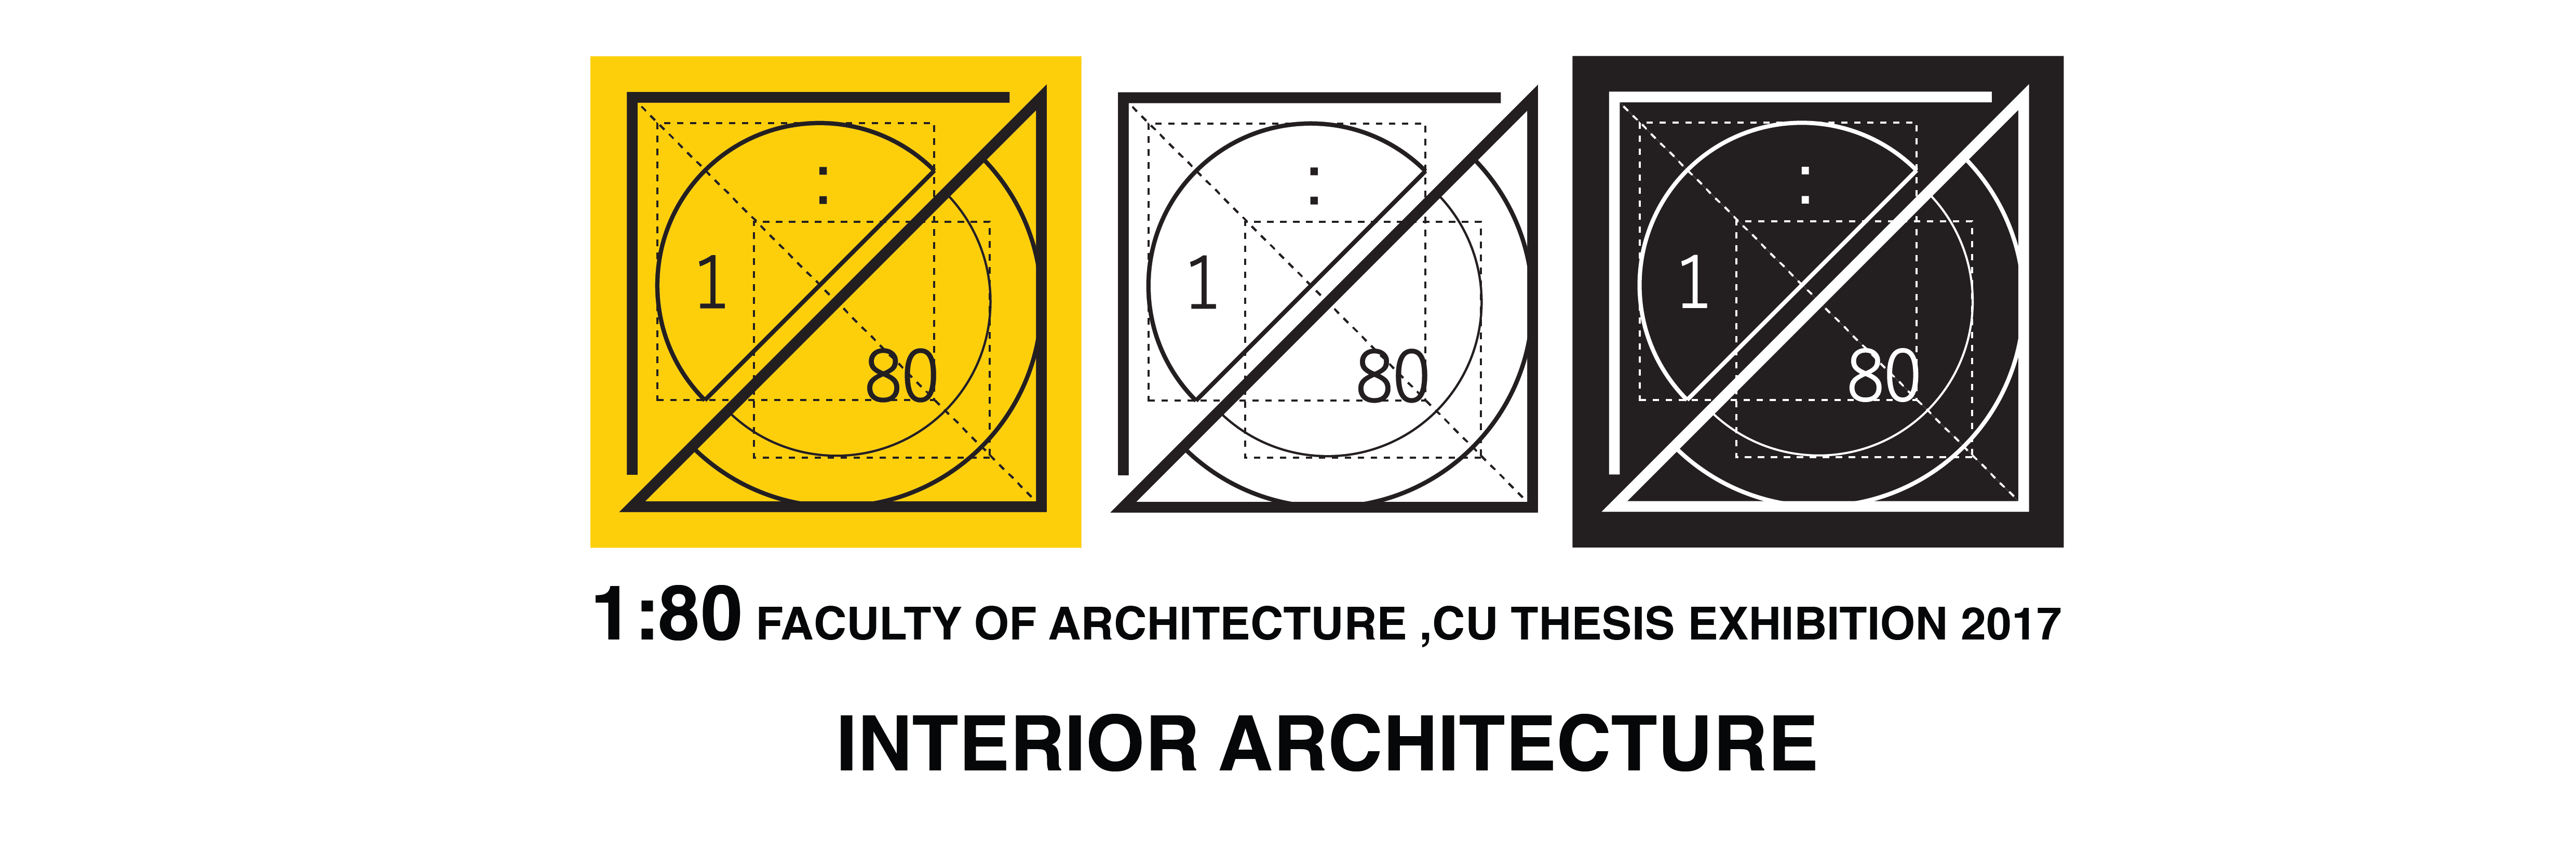 Office - 1:80 CU Interior Architecture Thesis 2016